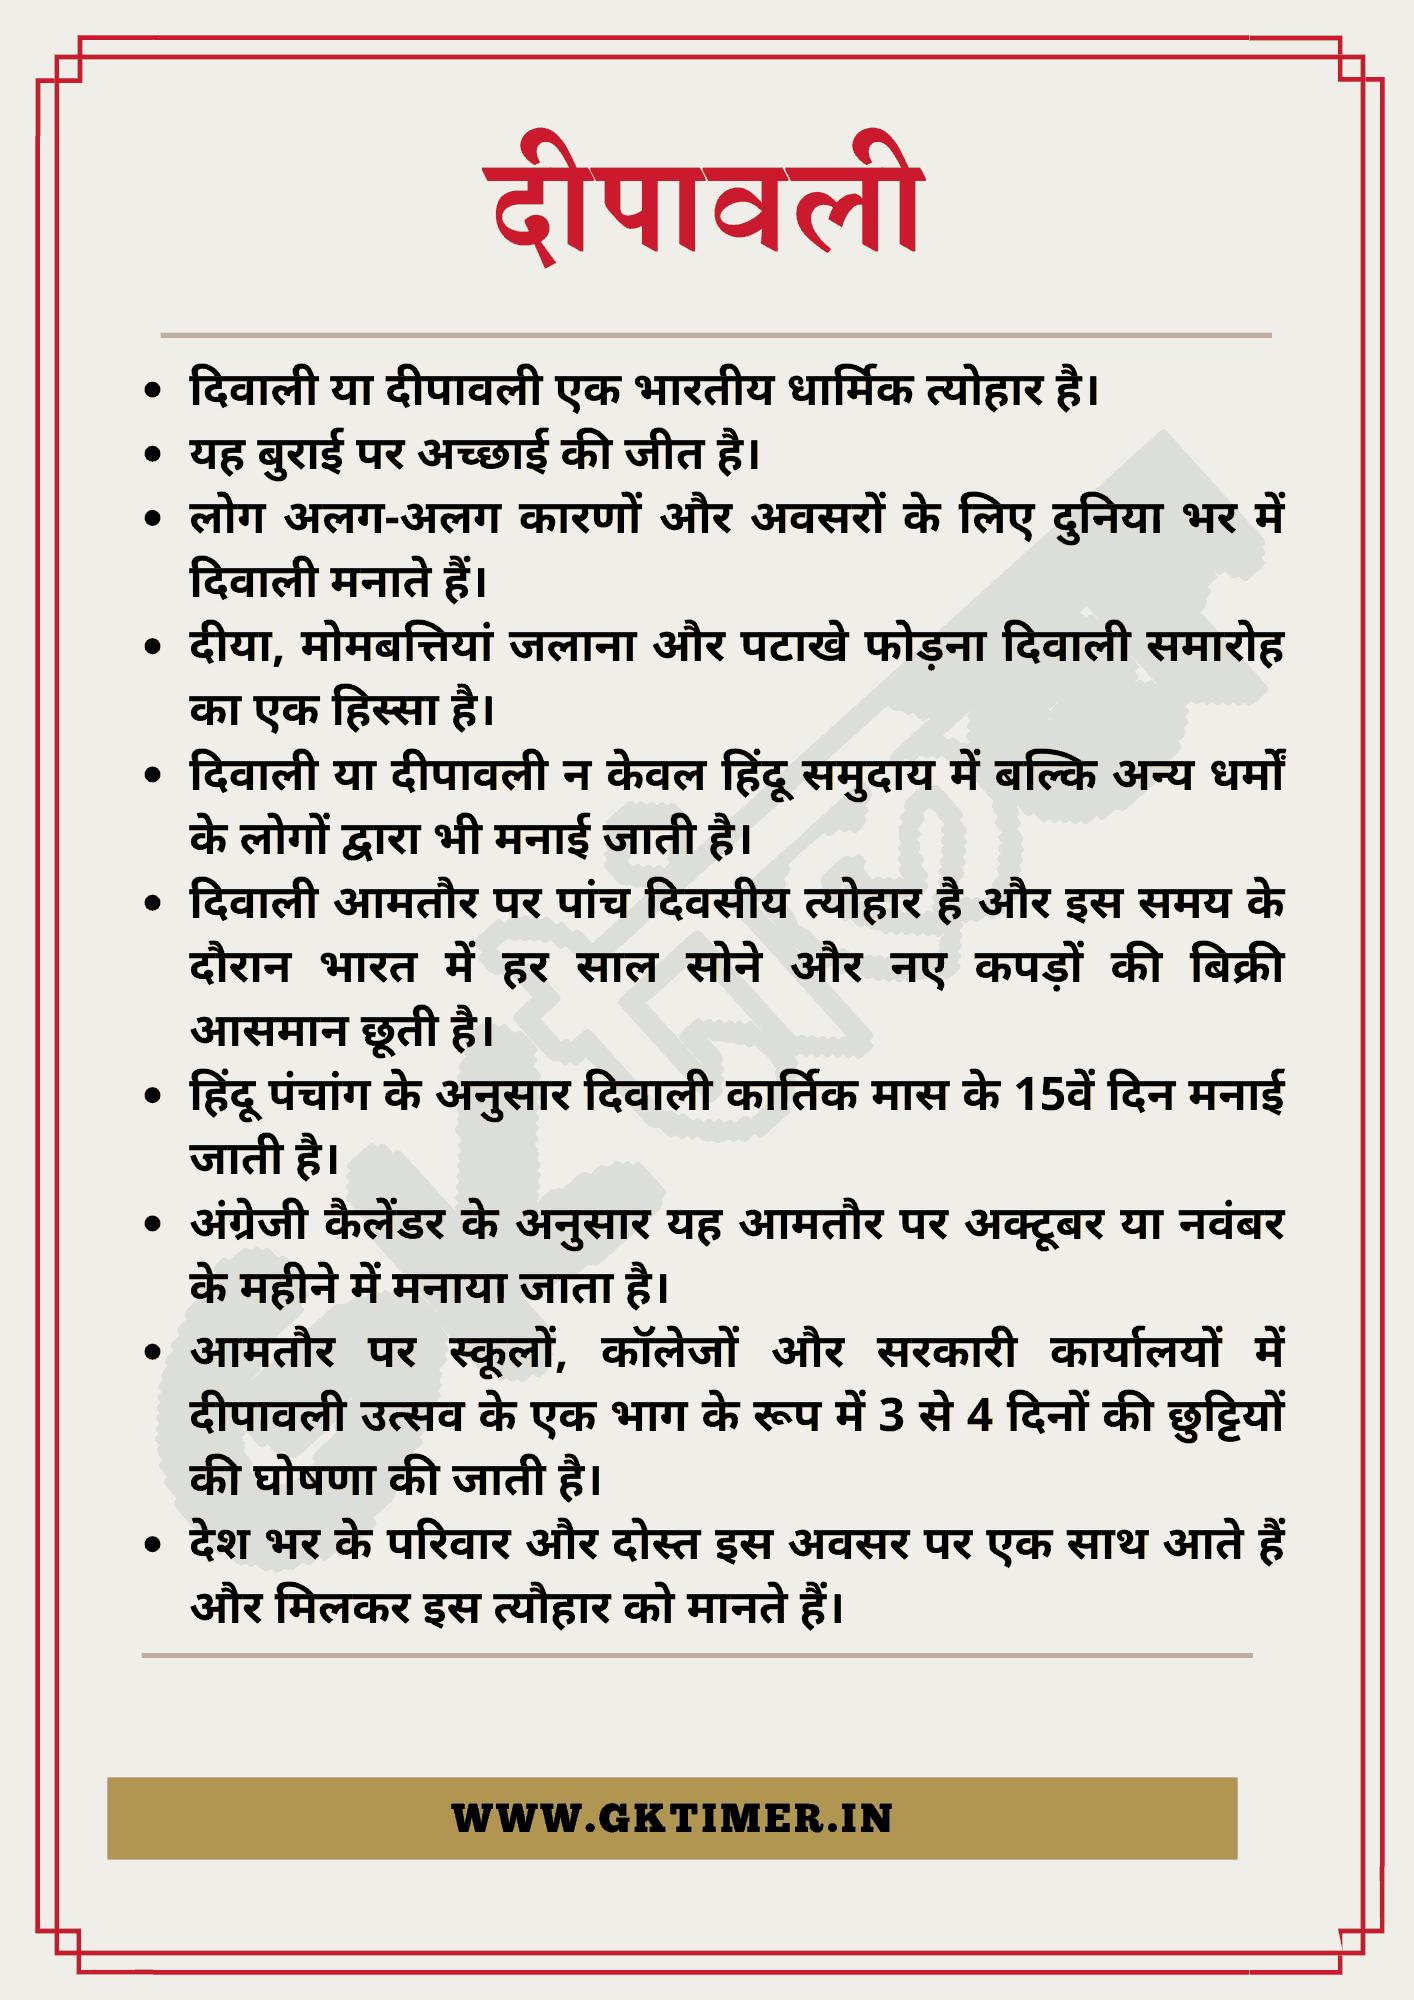 दीपावली पर निबंध | Diwali Essay in Hindi | 10 Lines on Diwali in Hindi